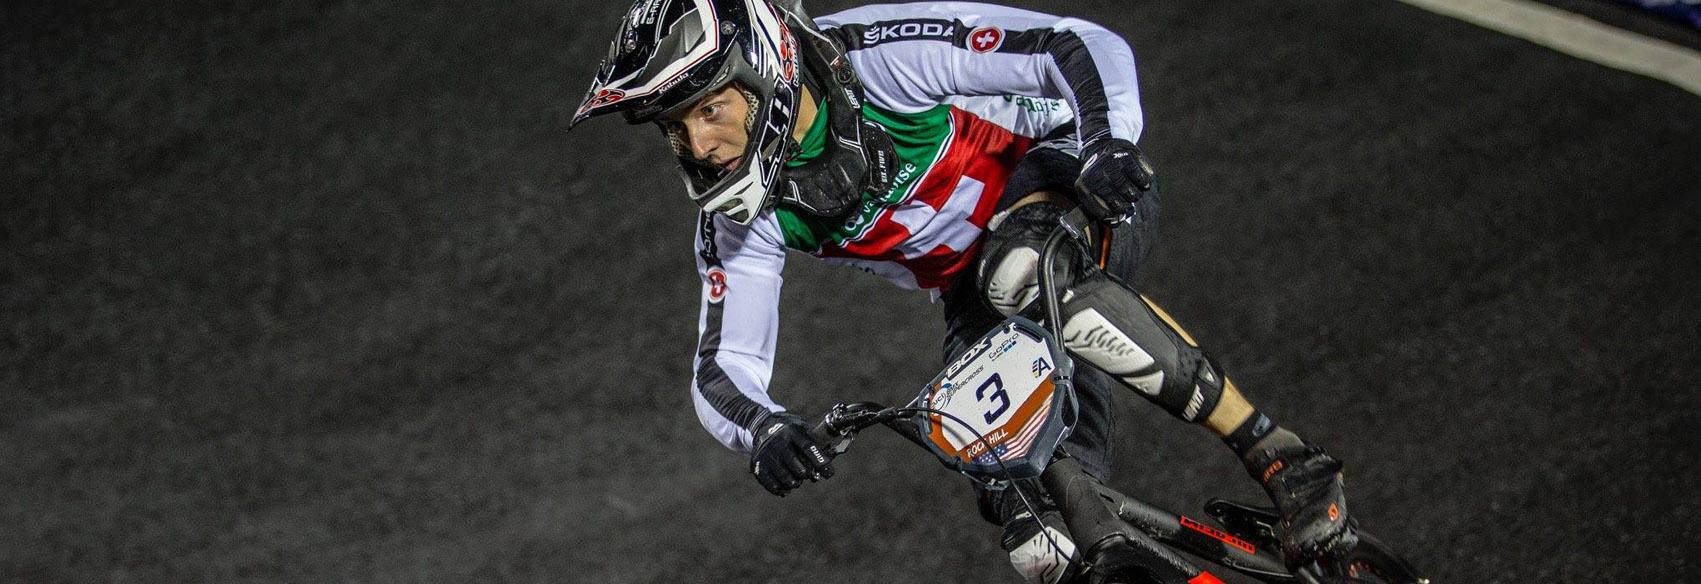 David Graf UCI BMX SX